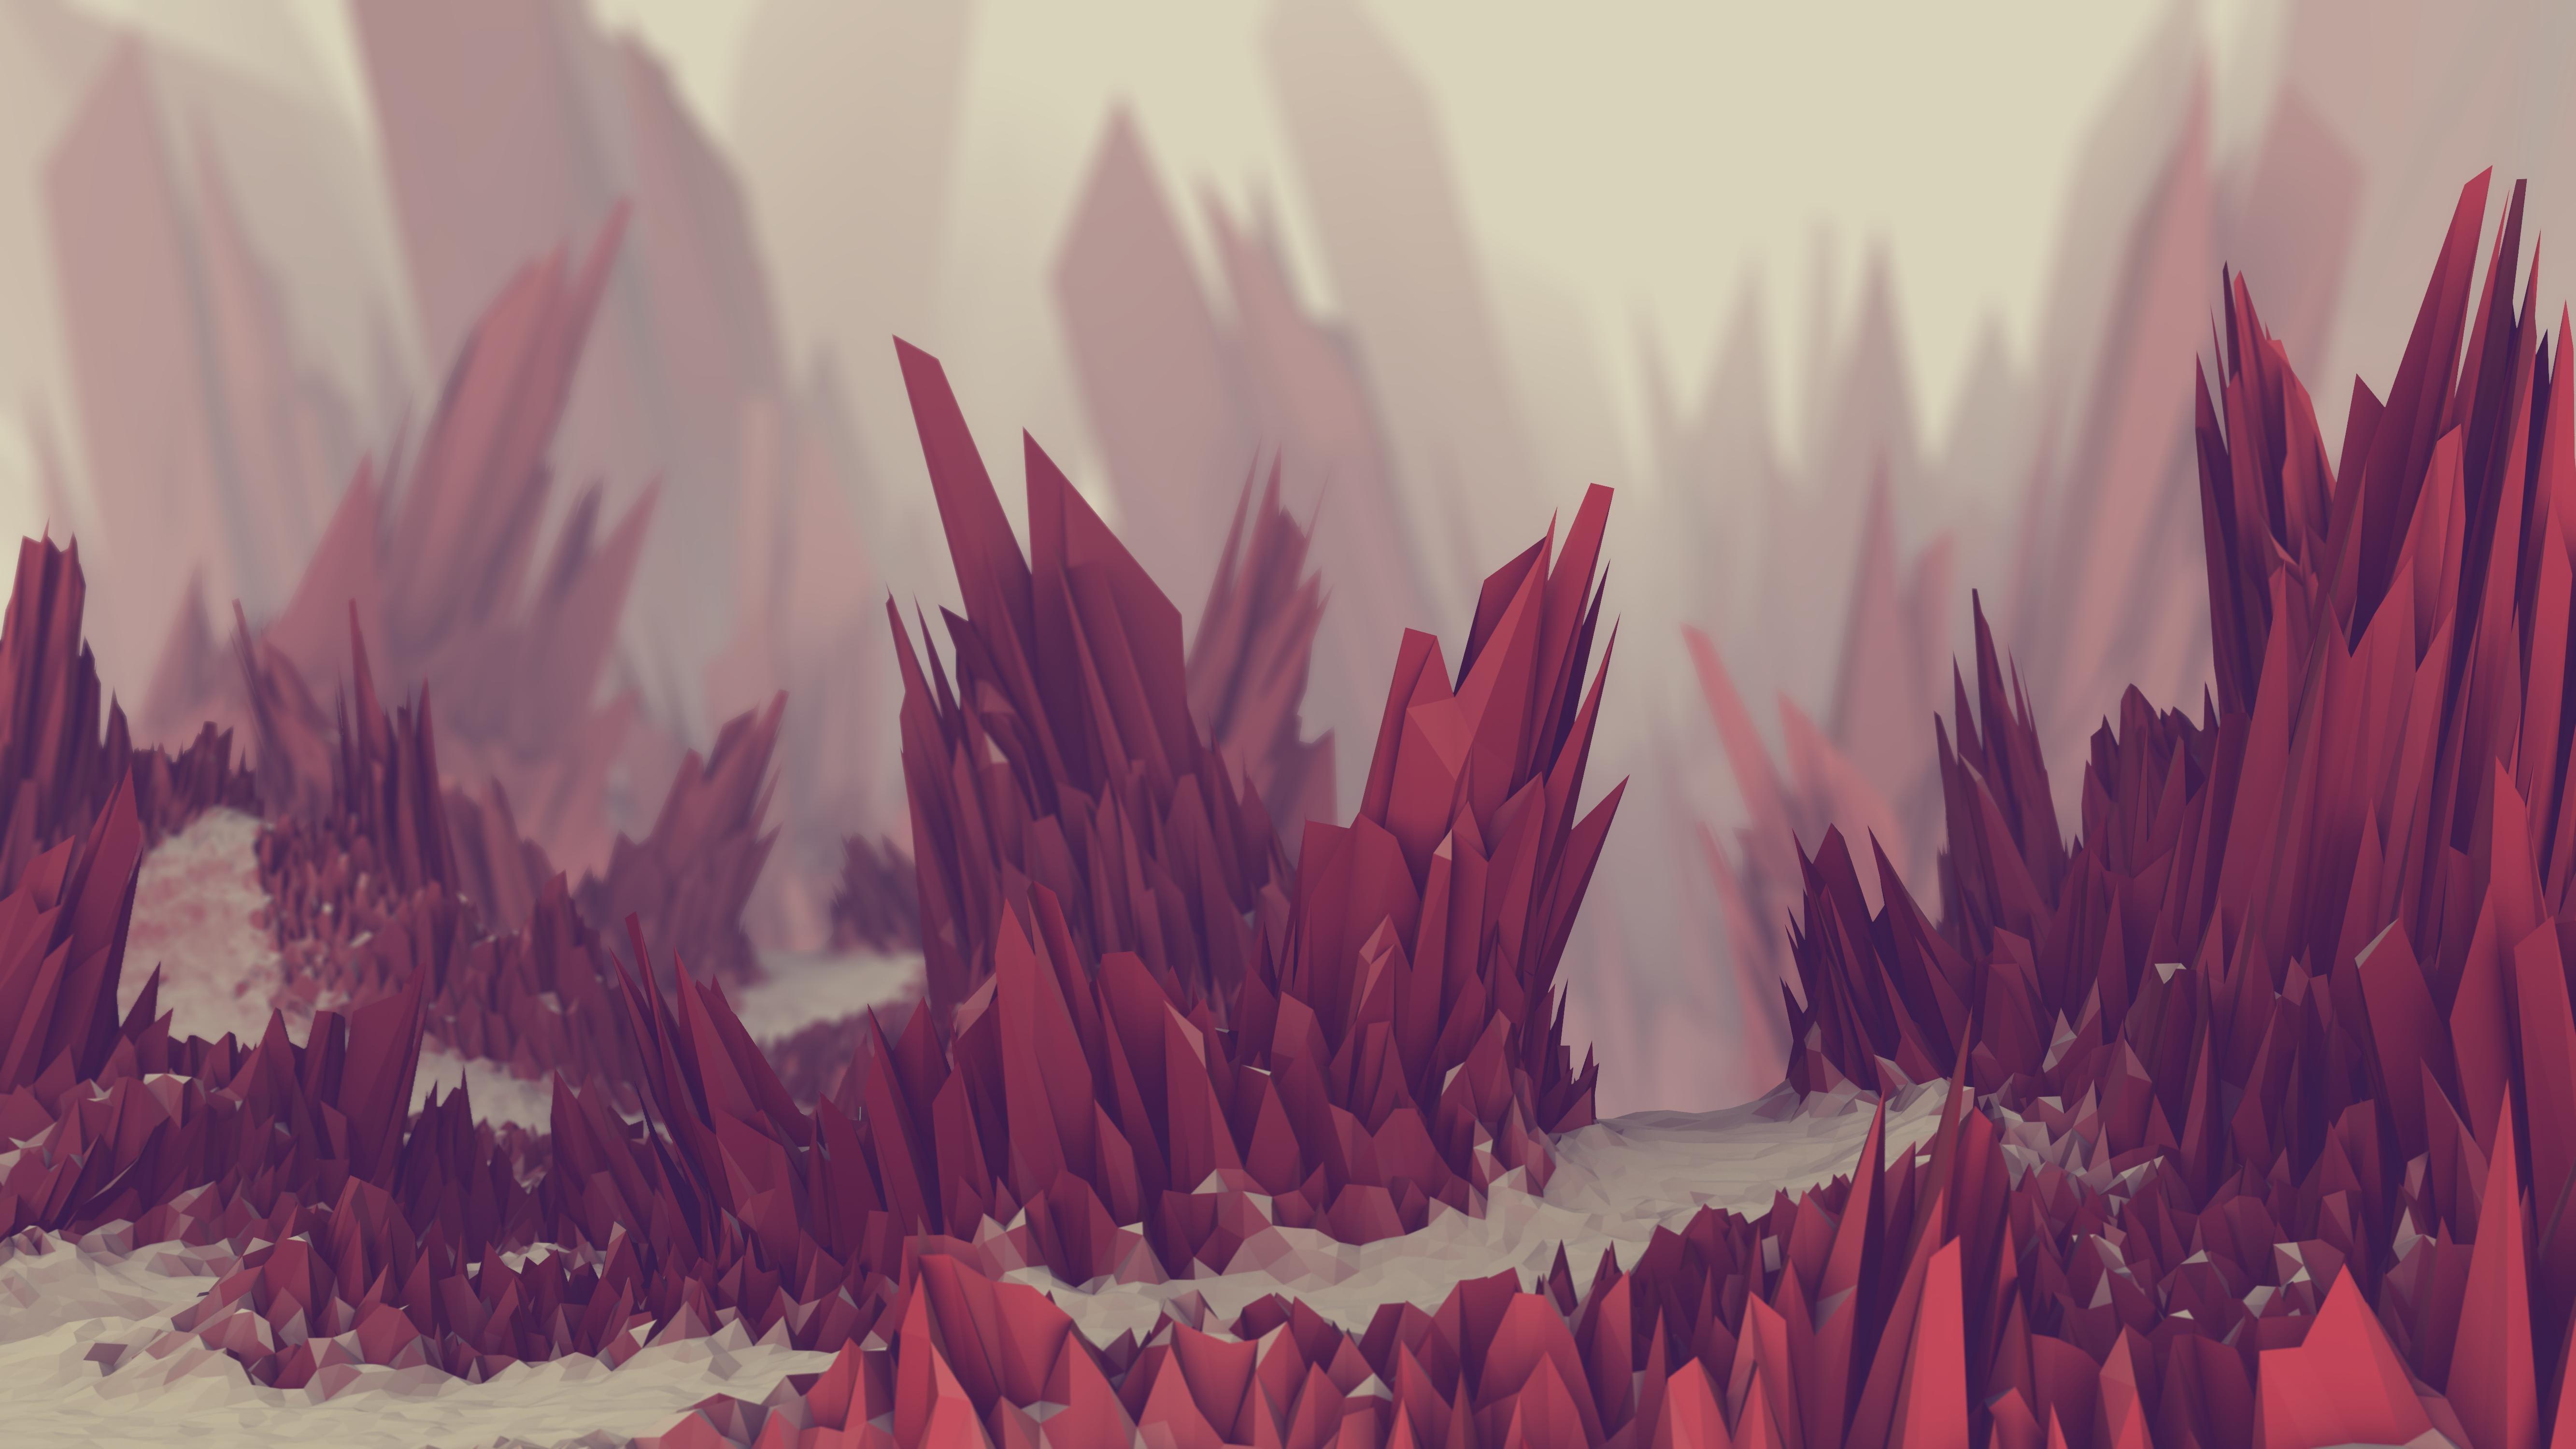 Low Poly Landscape Wallpaper 4k , HD Wallpaper & Backgrounds